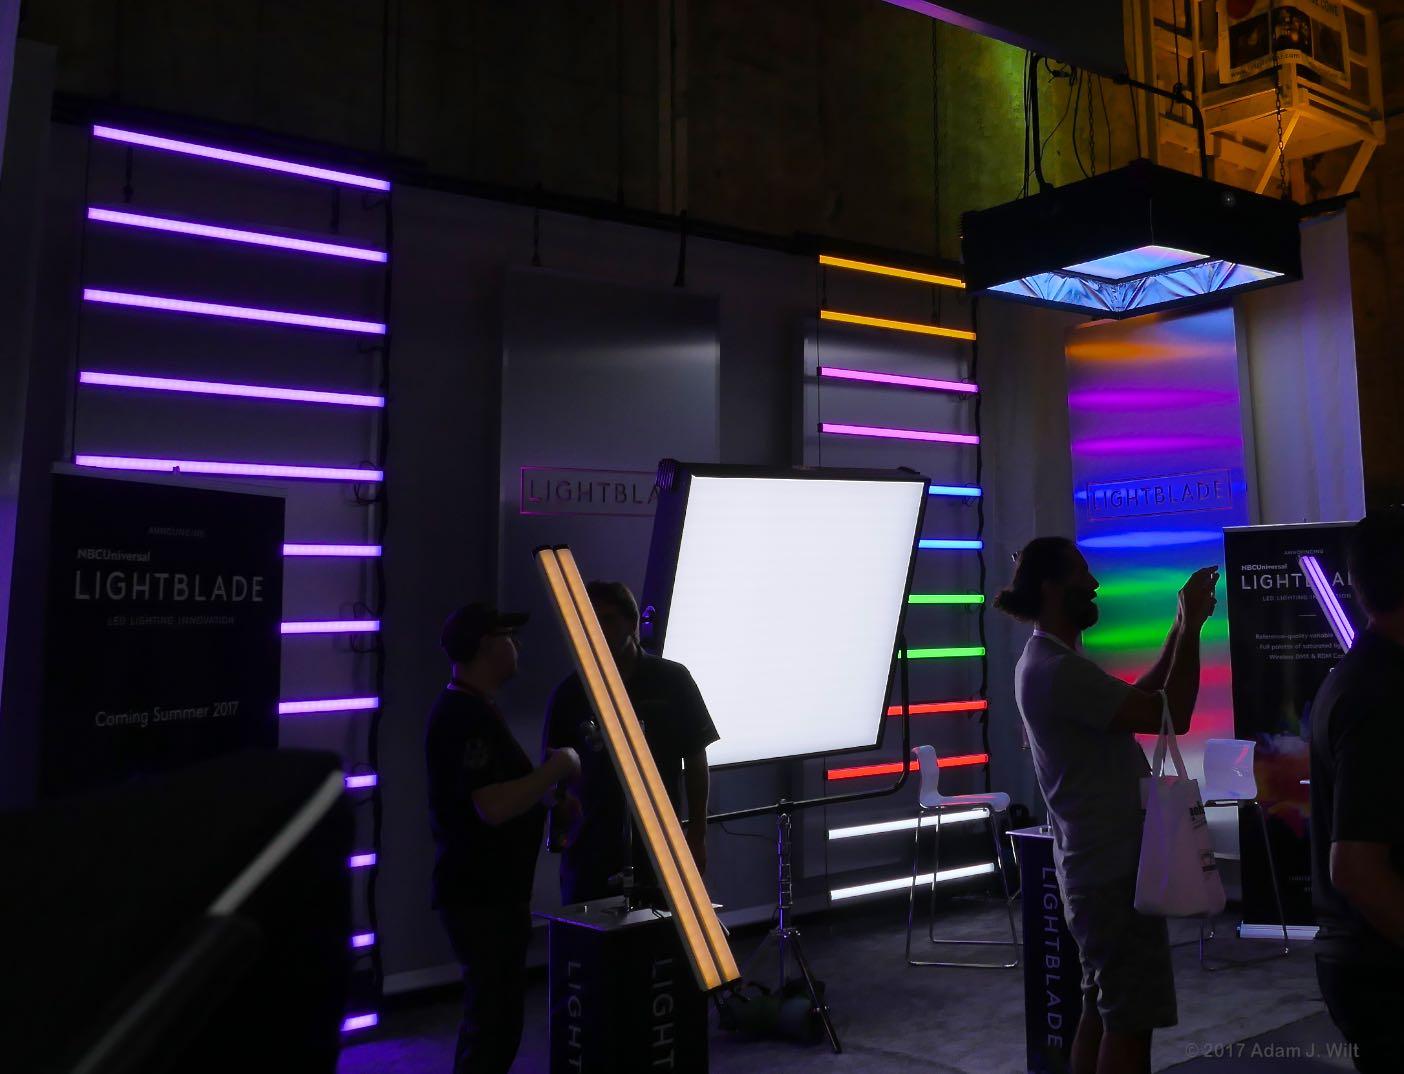 Lightblade LEDs